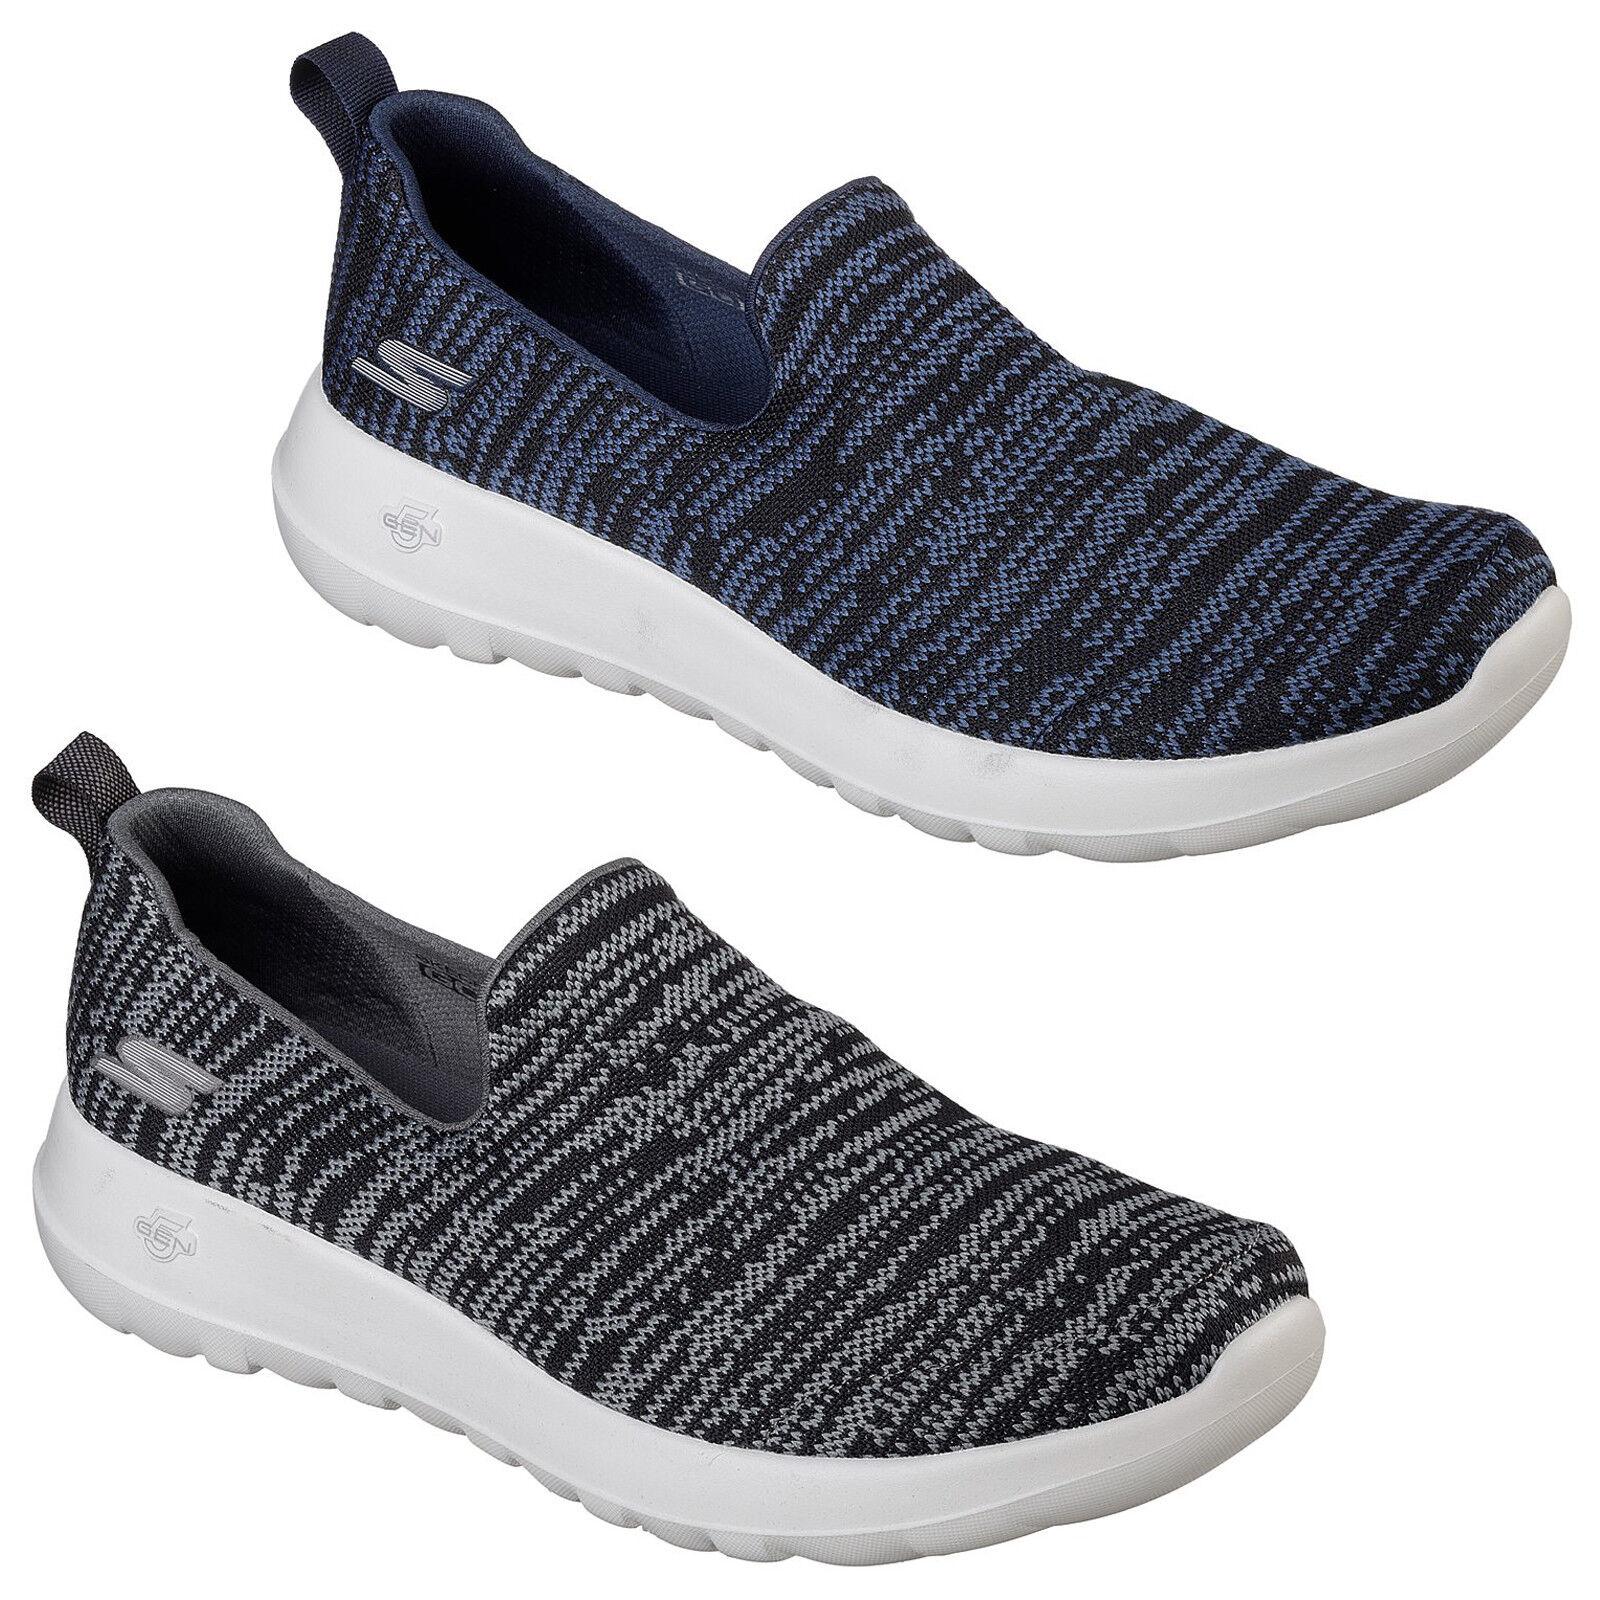 Skechers Go Walk Max Infinite Trainers Memory Foam Slip On Goga Run Mens shoes